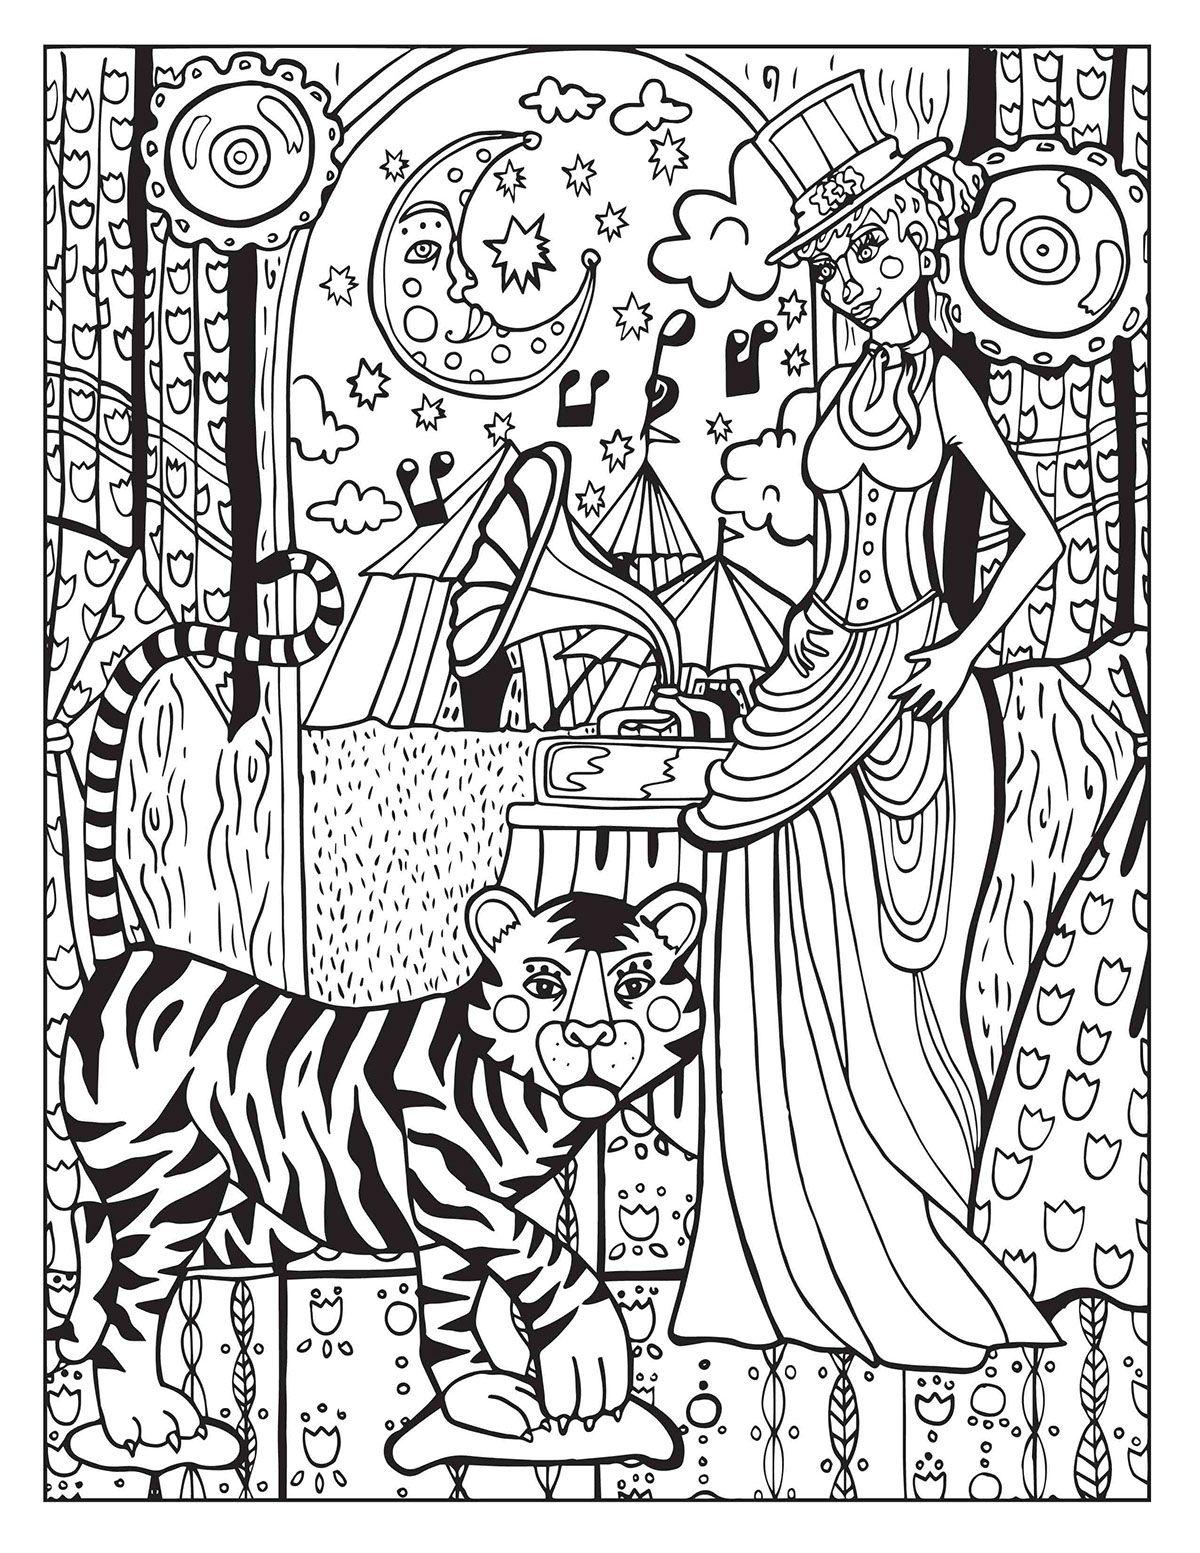 Coloriage Unicorn Coloring Pages Mandala Coloring Pages Coloring Pages [ 1553 x 1200 Pixel ]